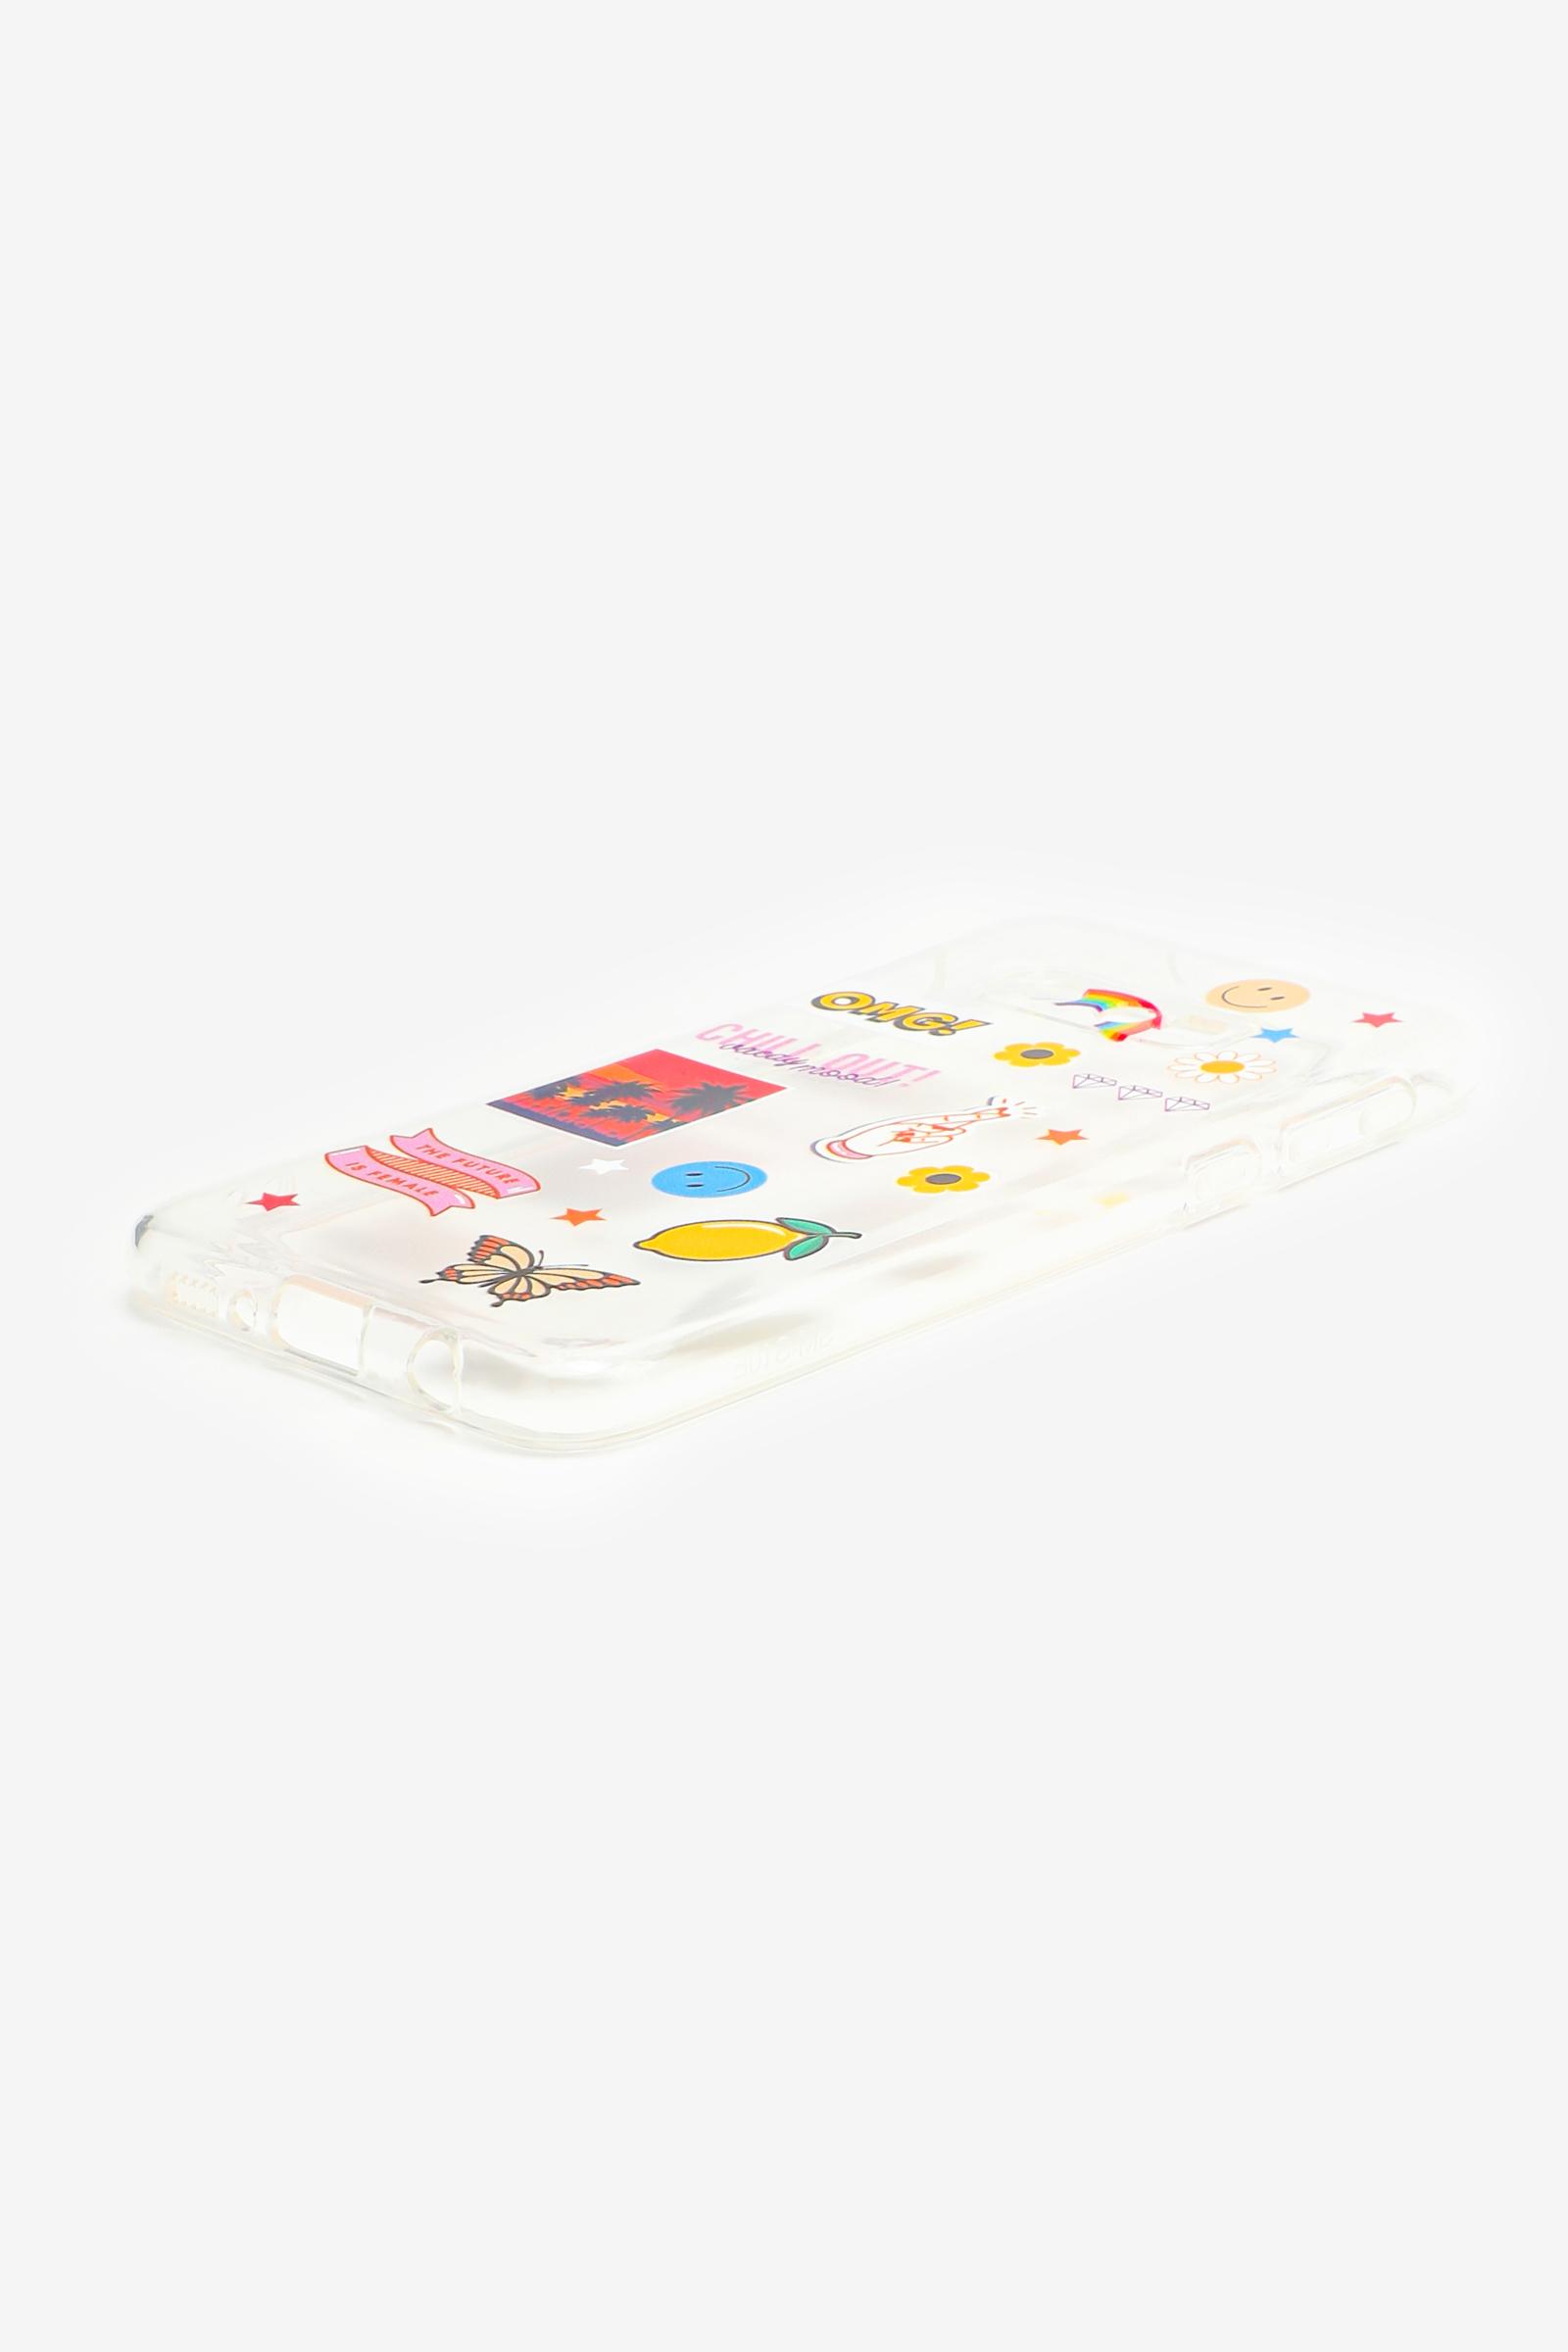 Sticker Print Samsung S10e Case